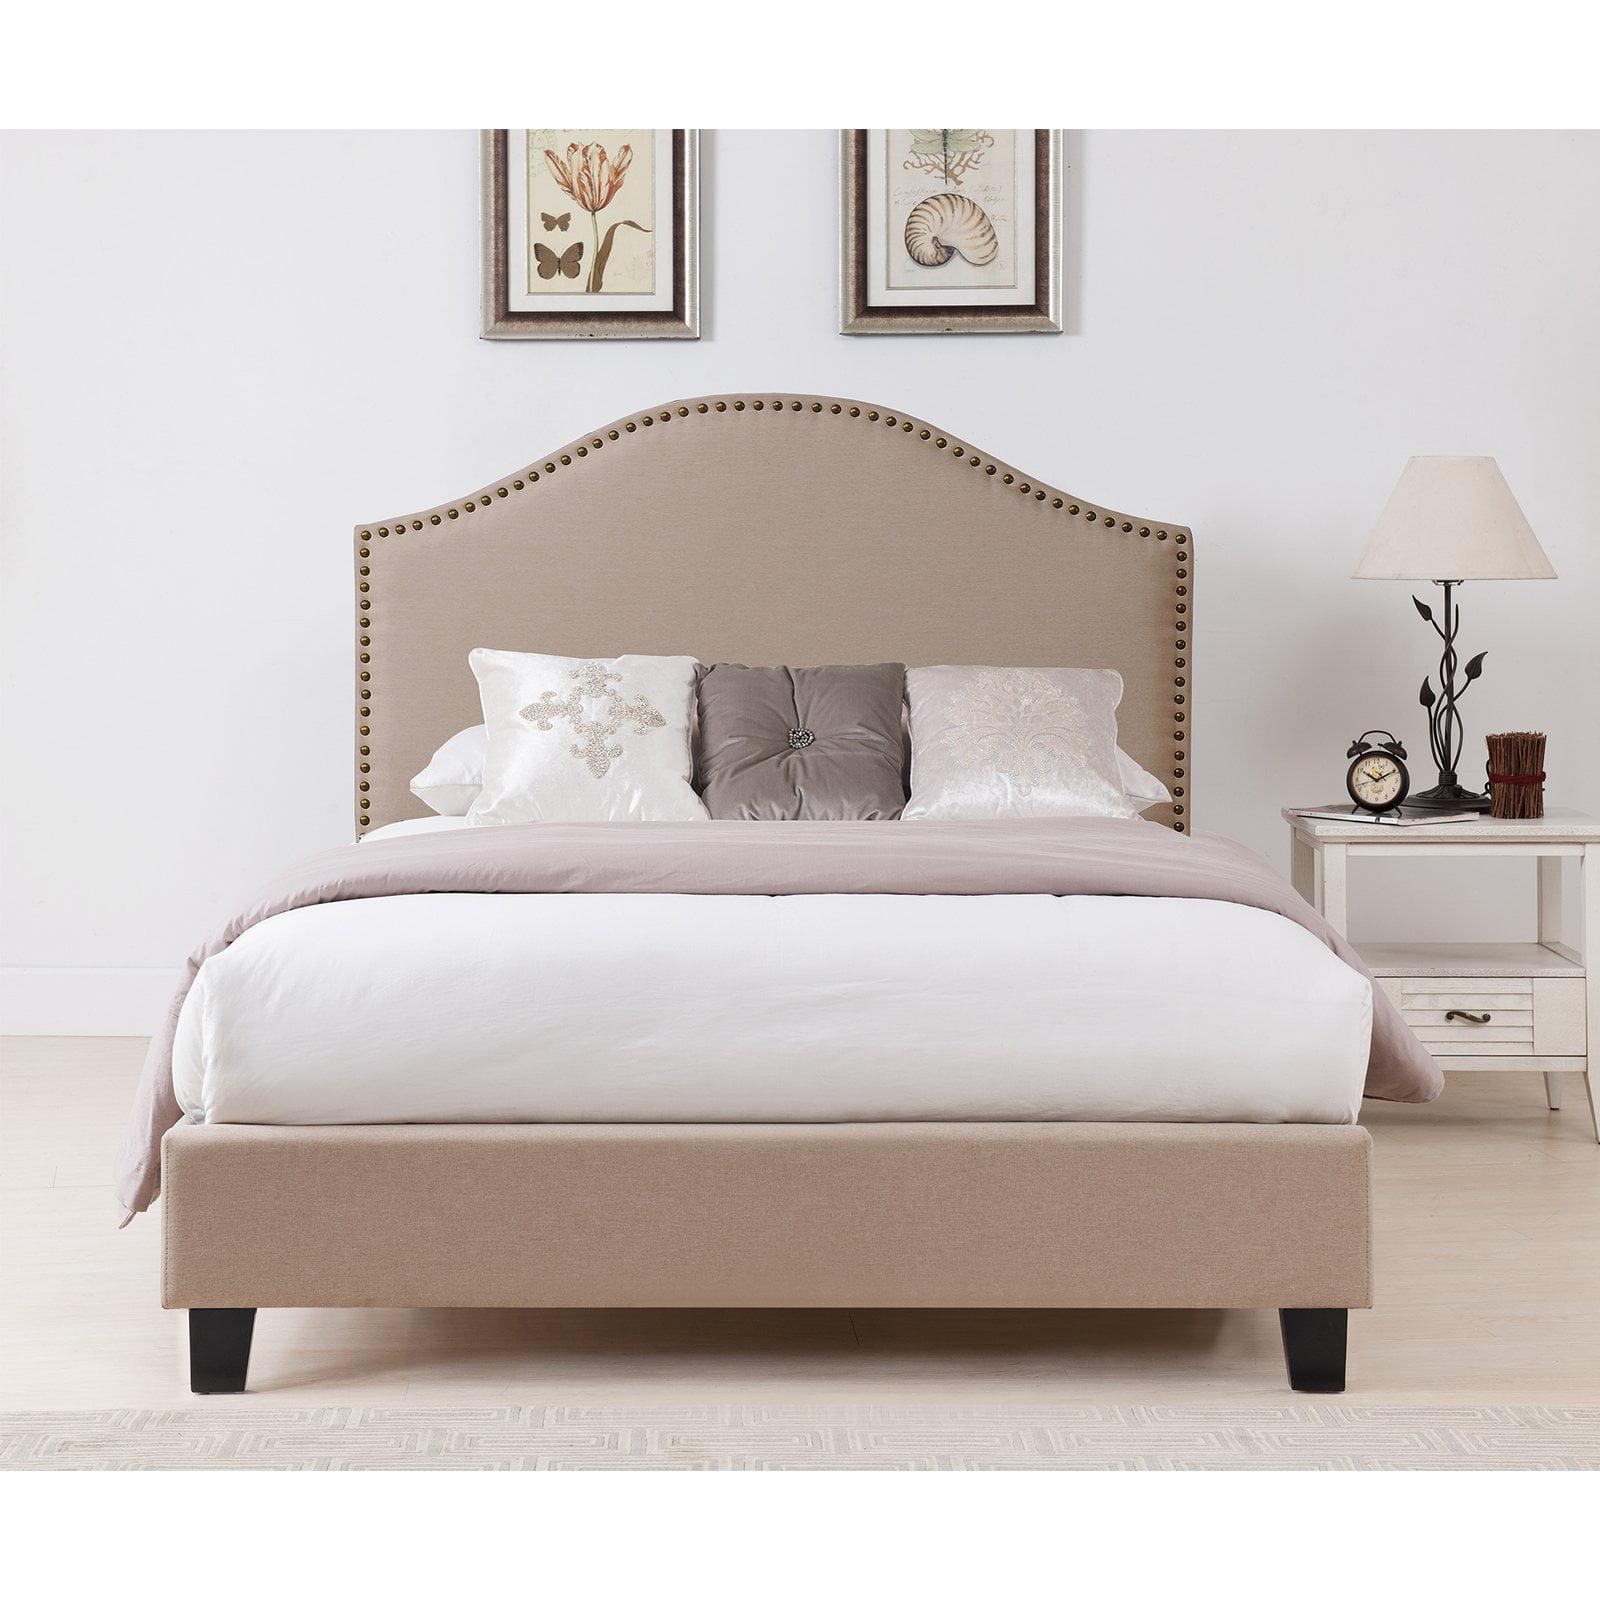 Boraam Beige Upholstered Nail Head Bed, Multiple Sizes